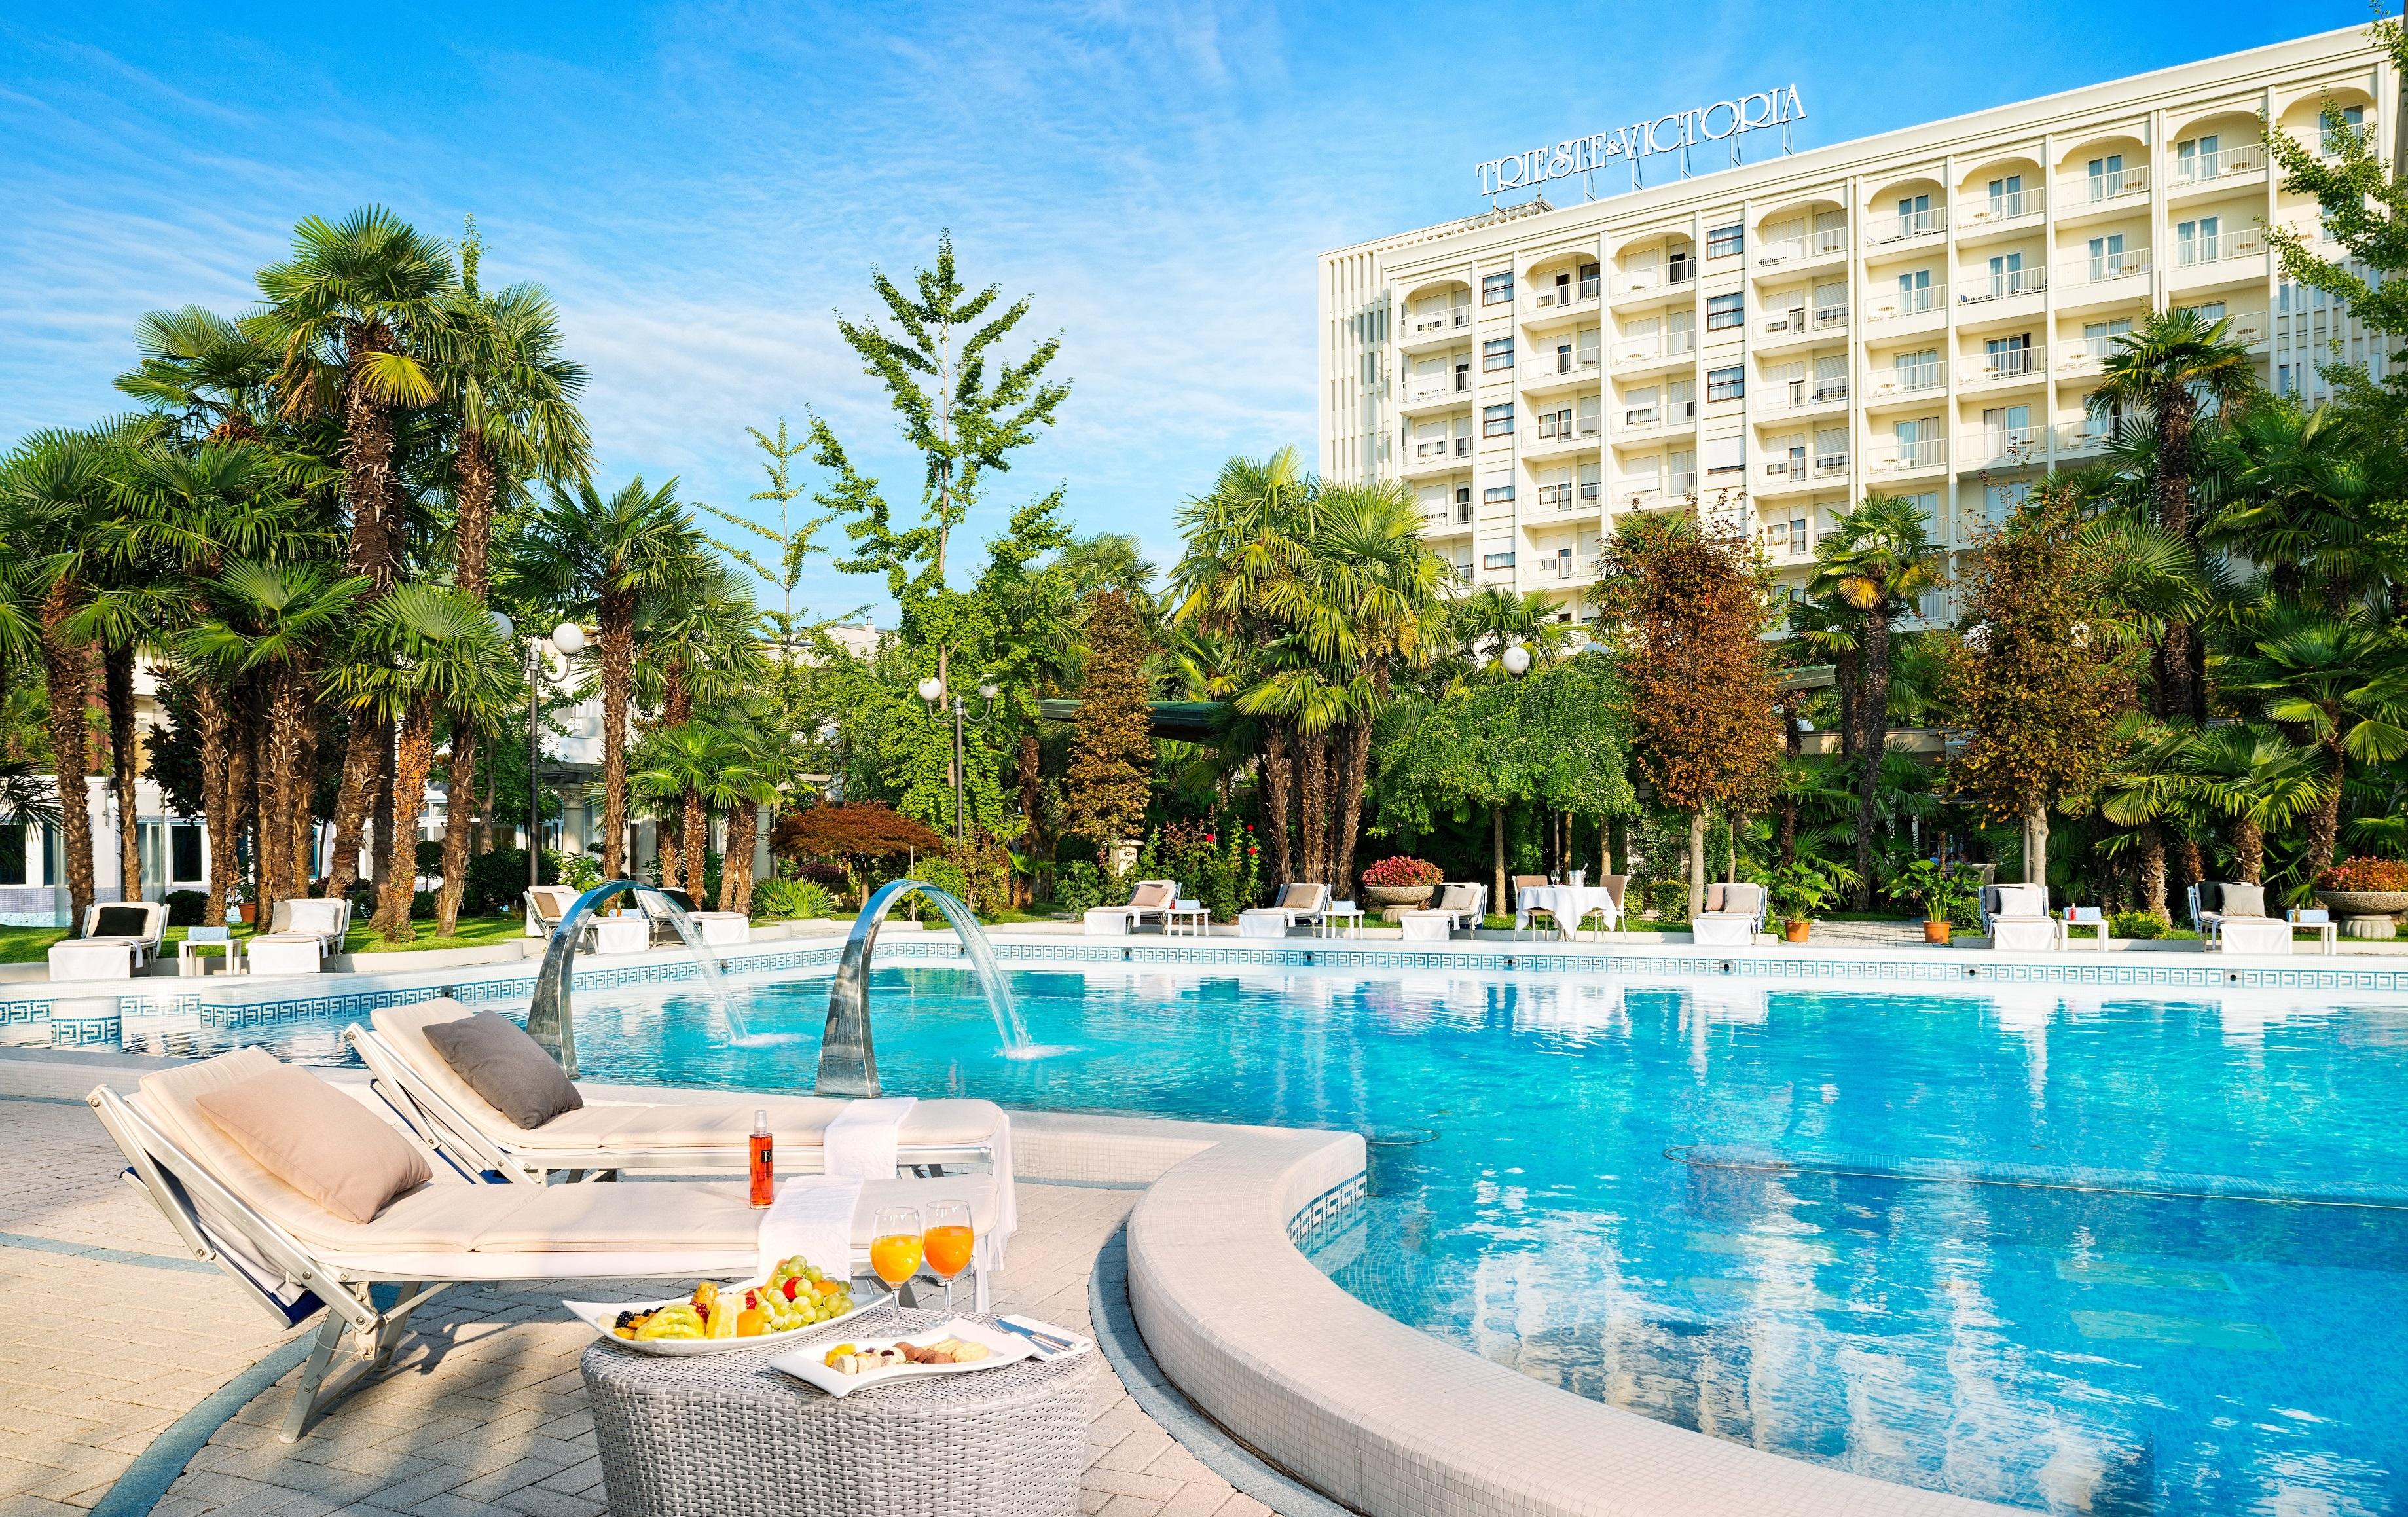 Hotel Trieste And Victoria Abano Terme Italien